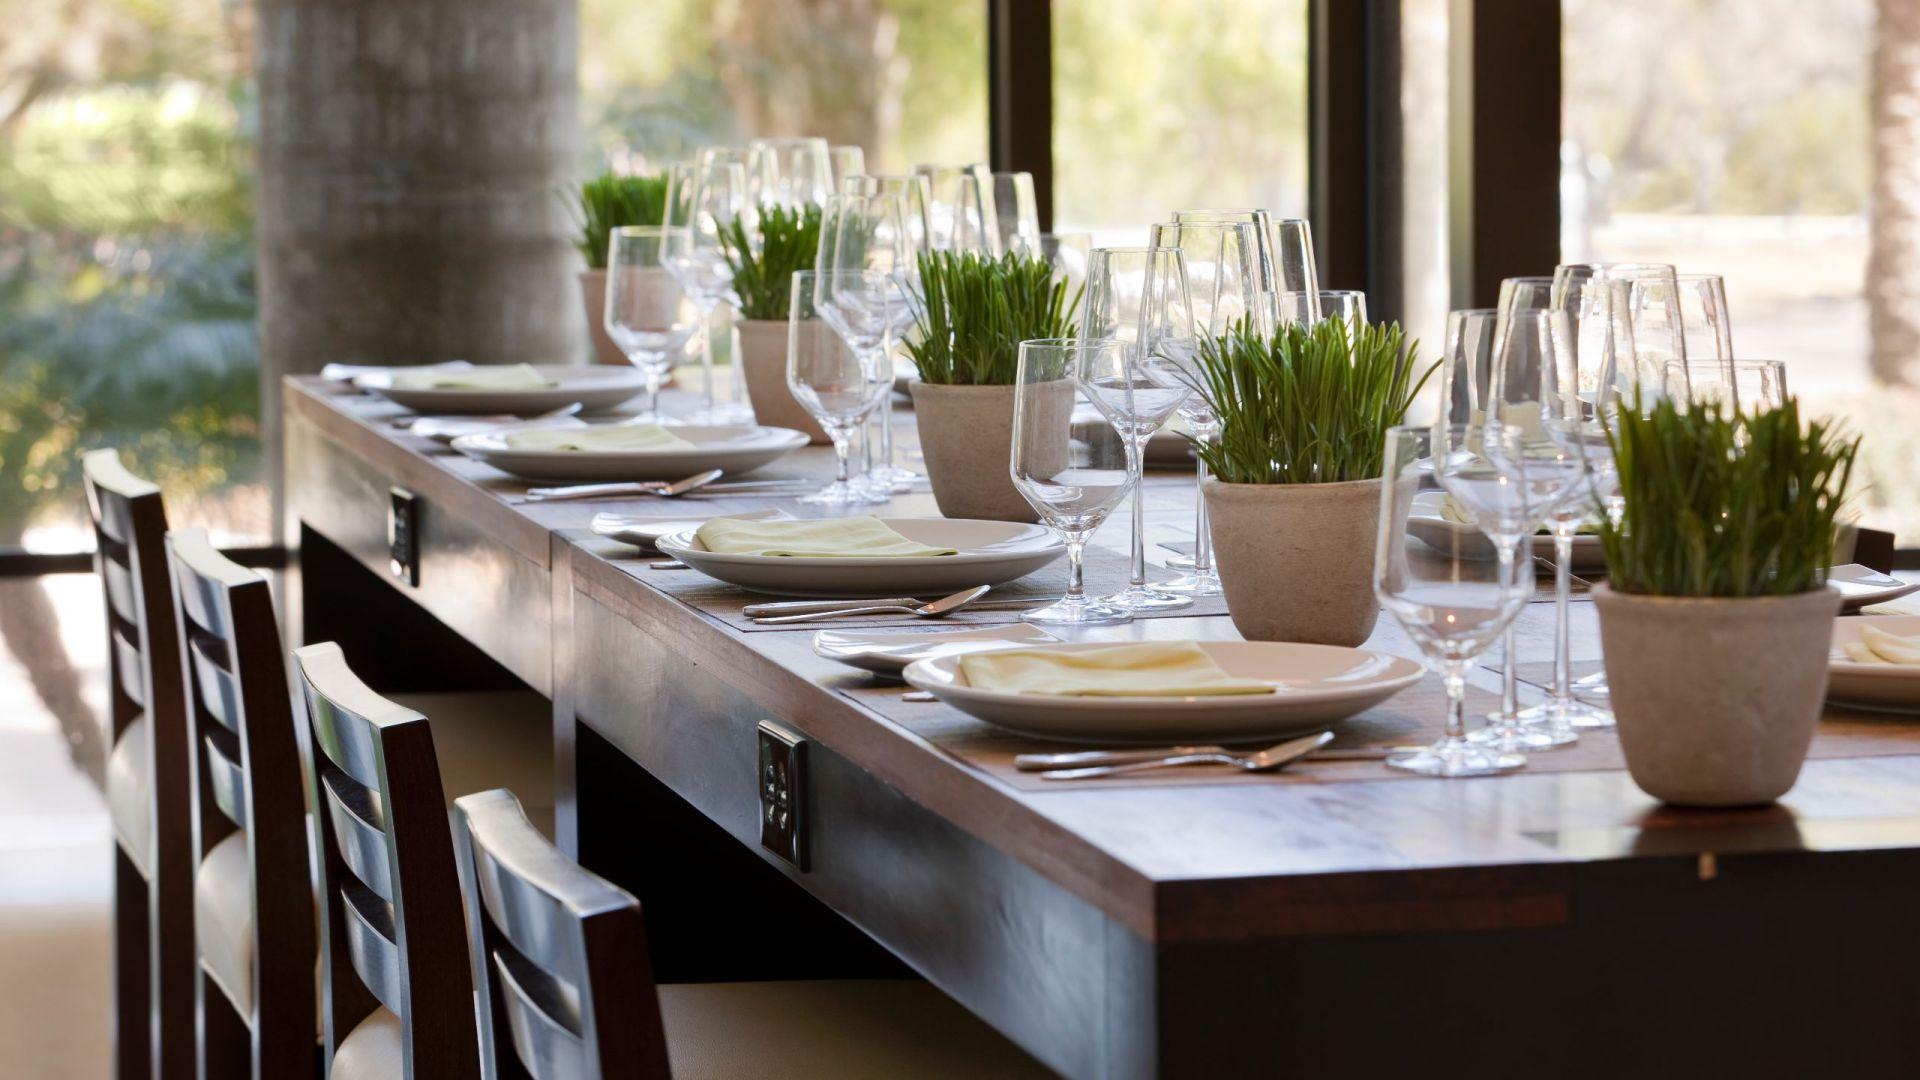 Hyatt Regency Sarasota Restaurants